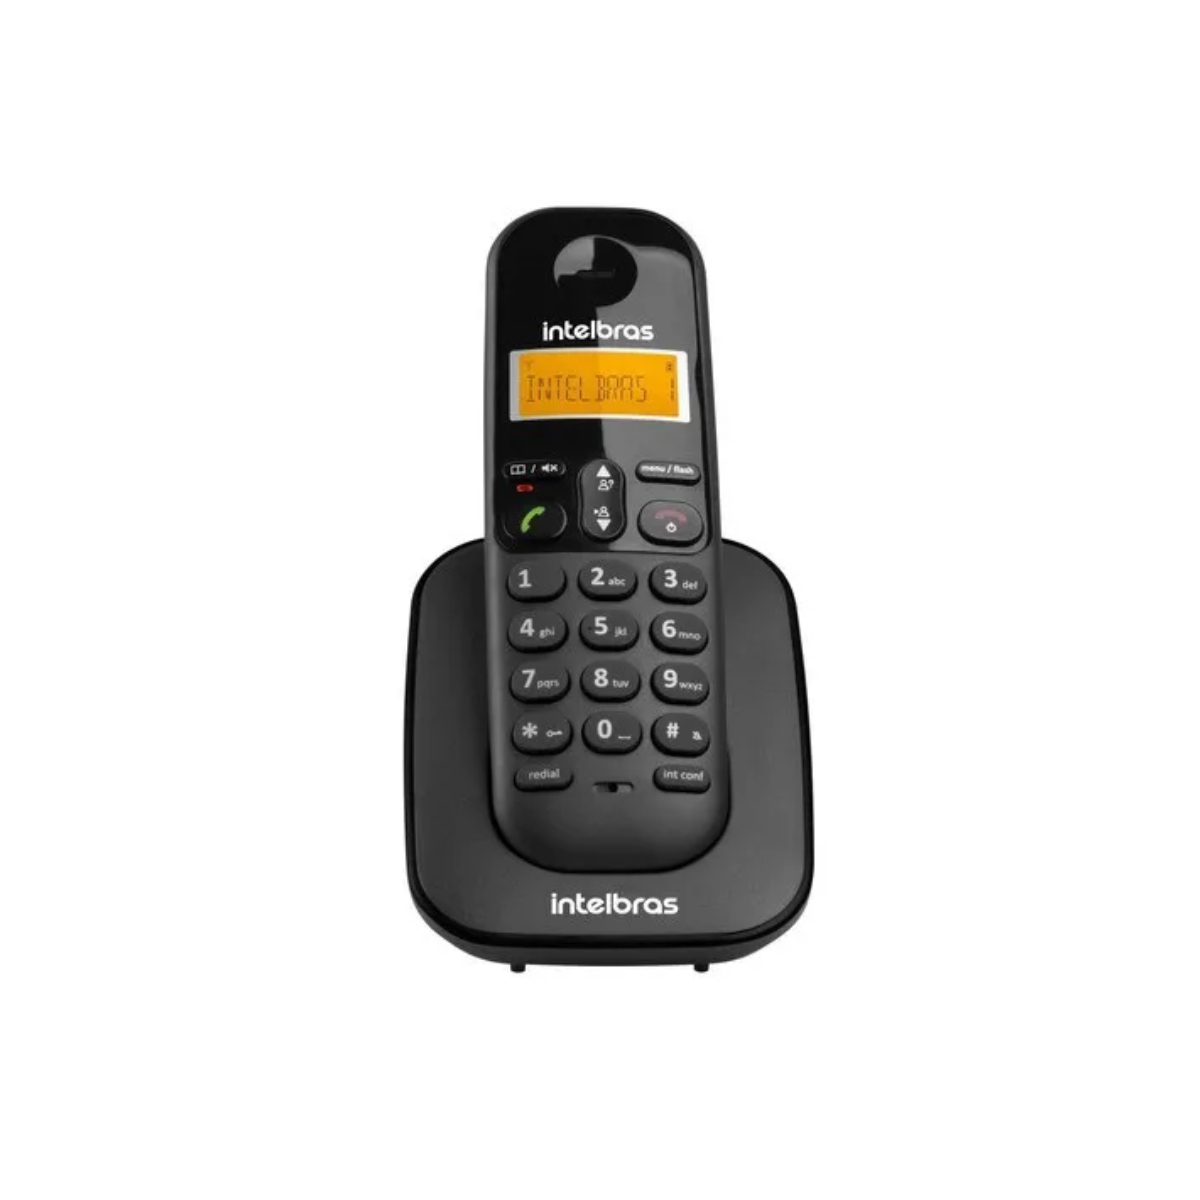 KIT TELEFONE INTELBRAS SEM FIO TS 3110 + 05 RAMAL TS 3111 PRETO